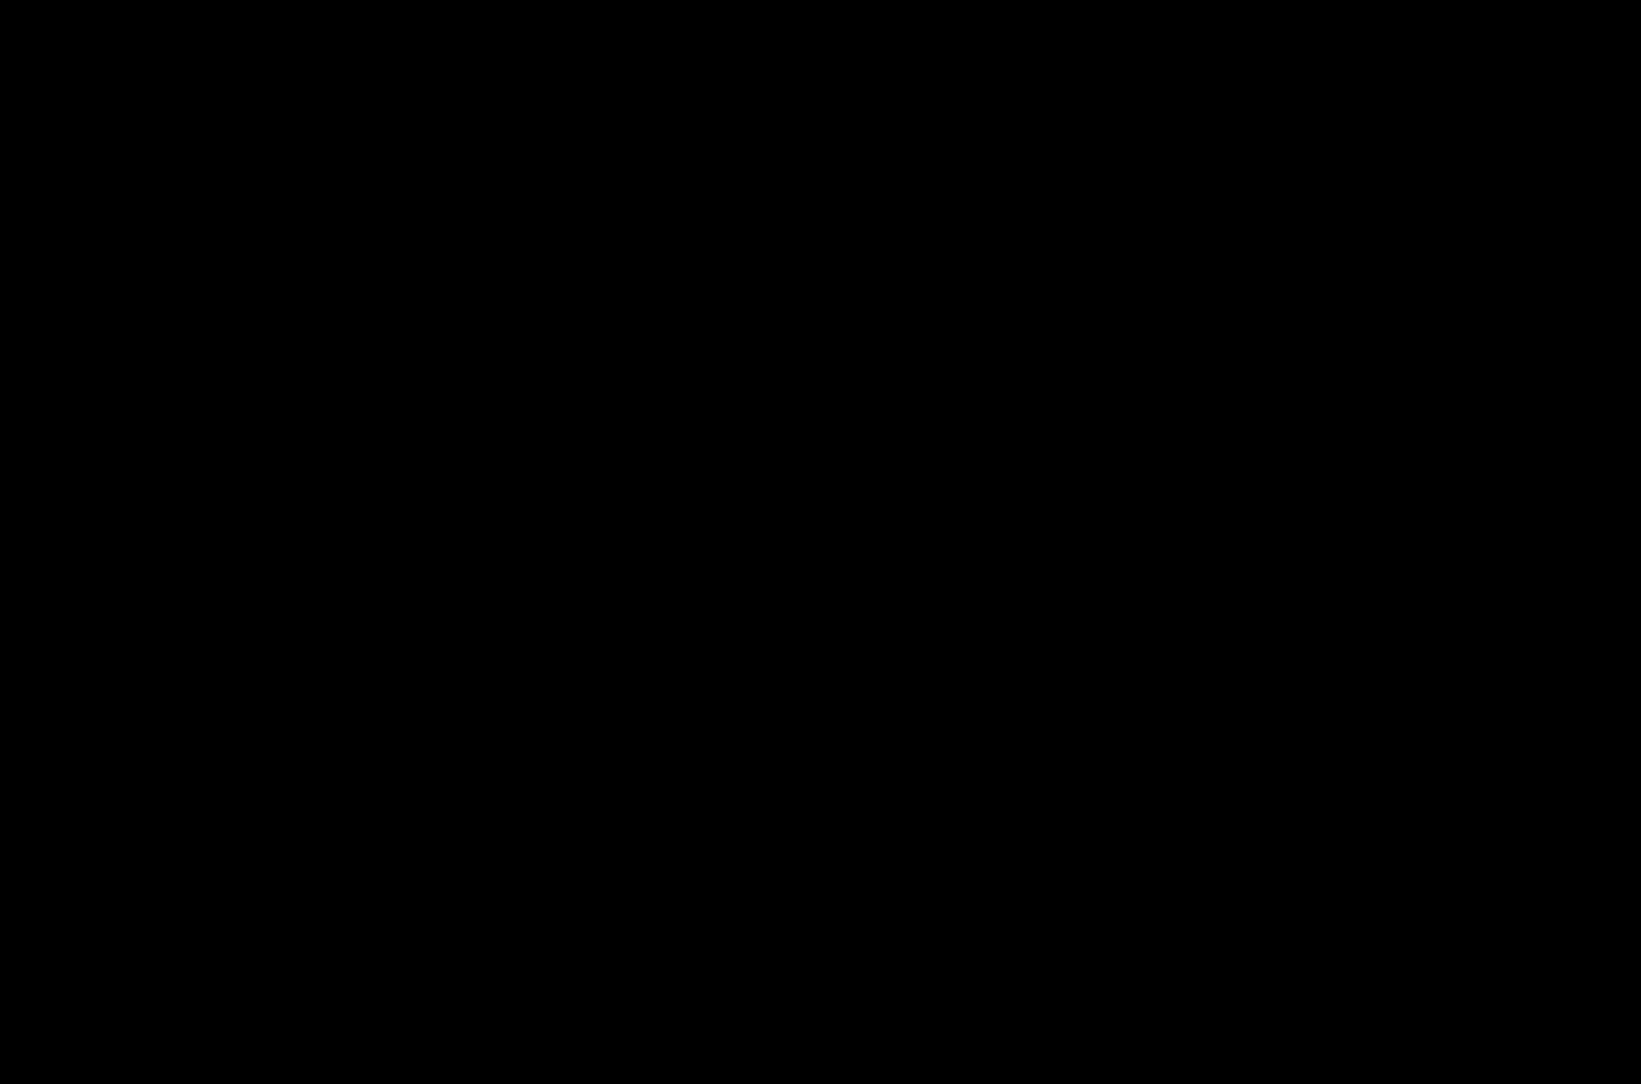 https://www.bheroes.it/wp-content/uploads/2021/07/ThisUnique_black.png